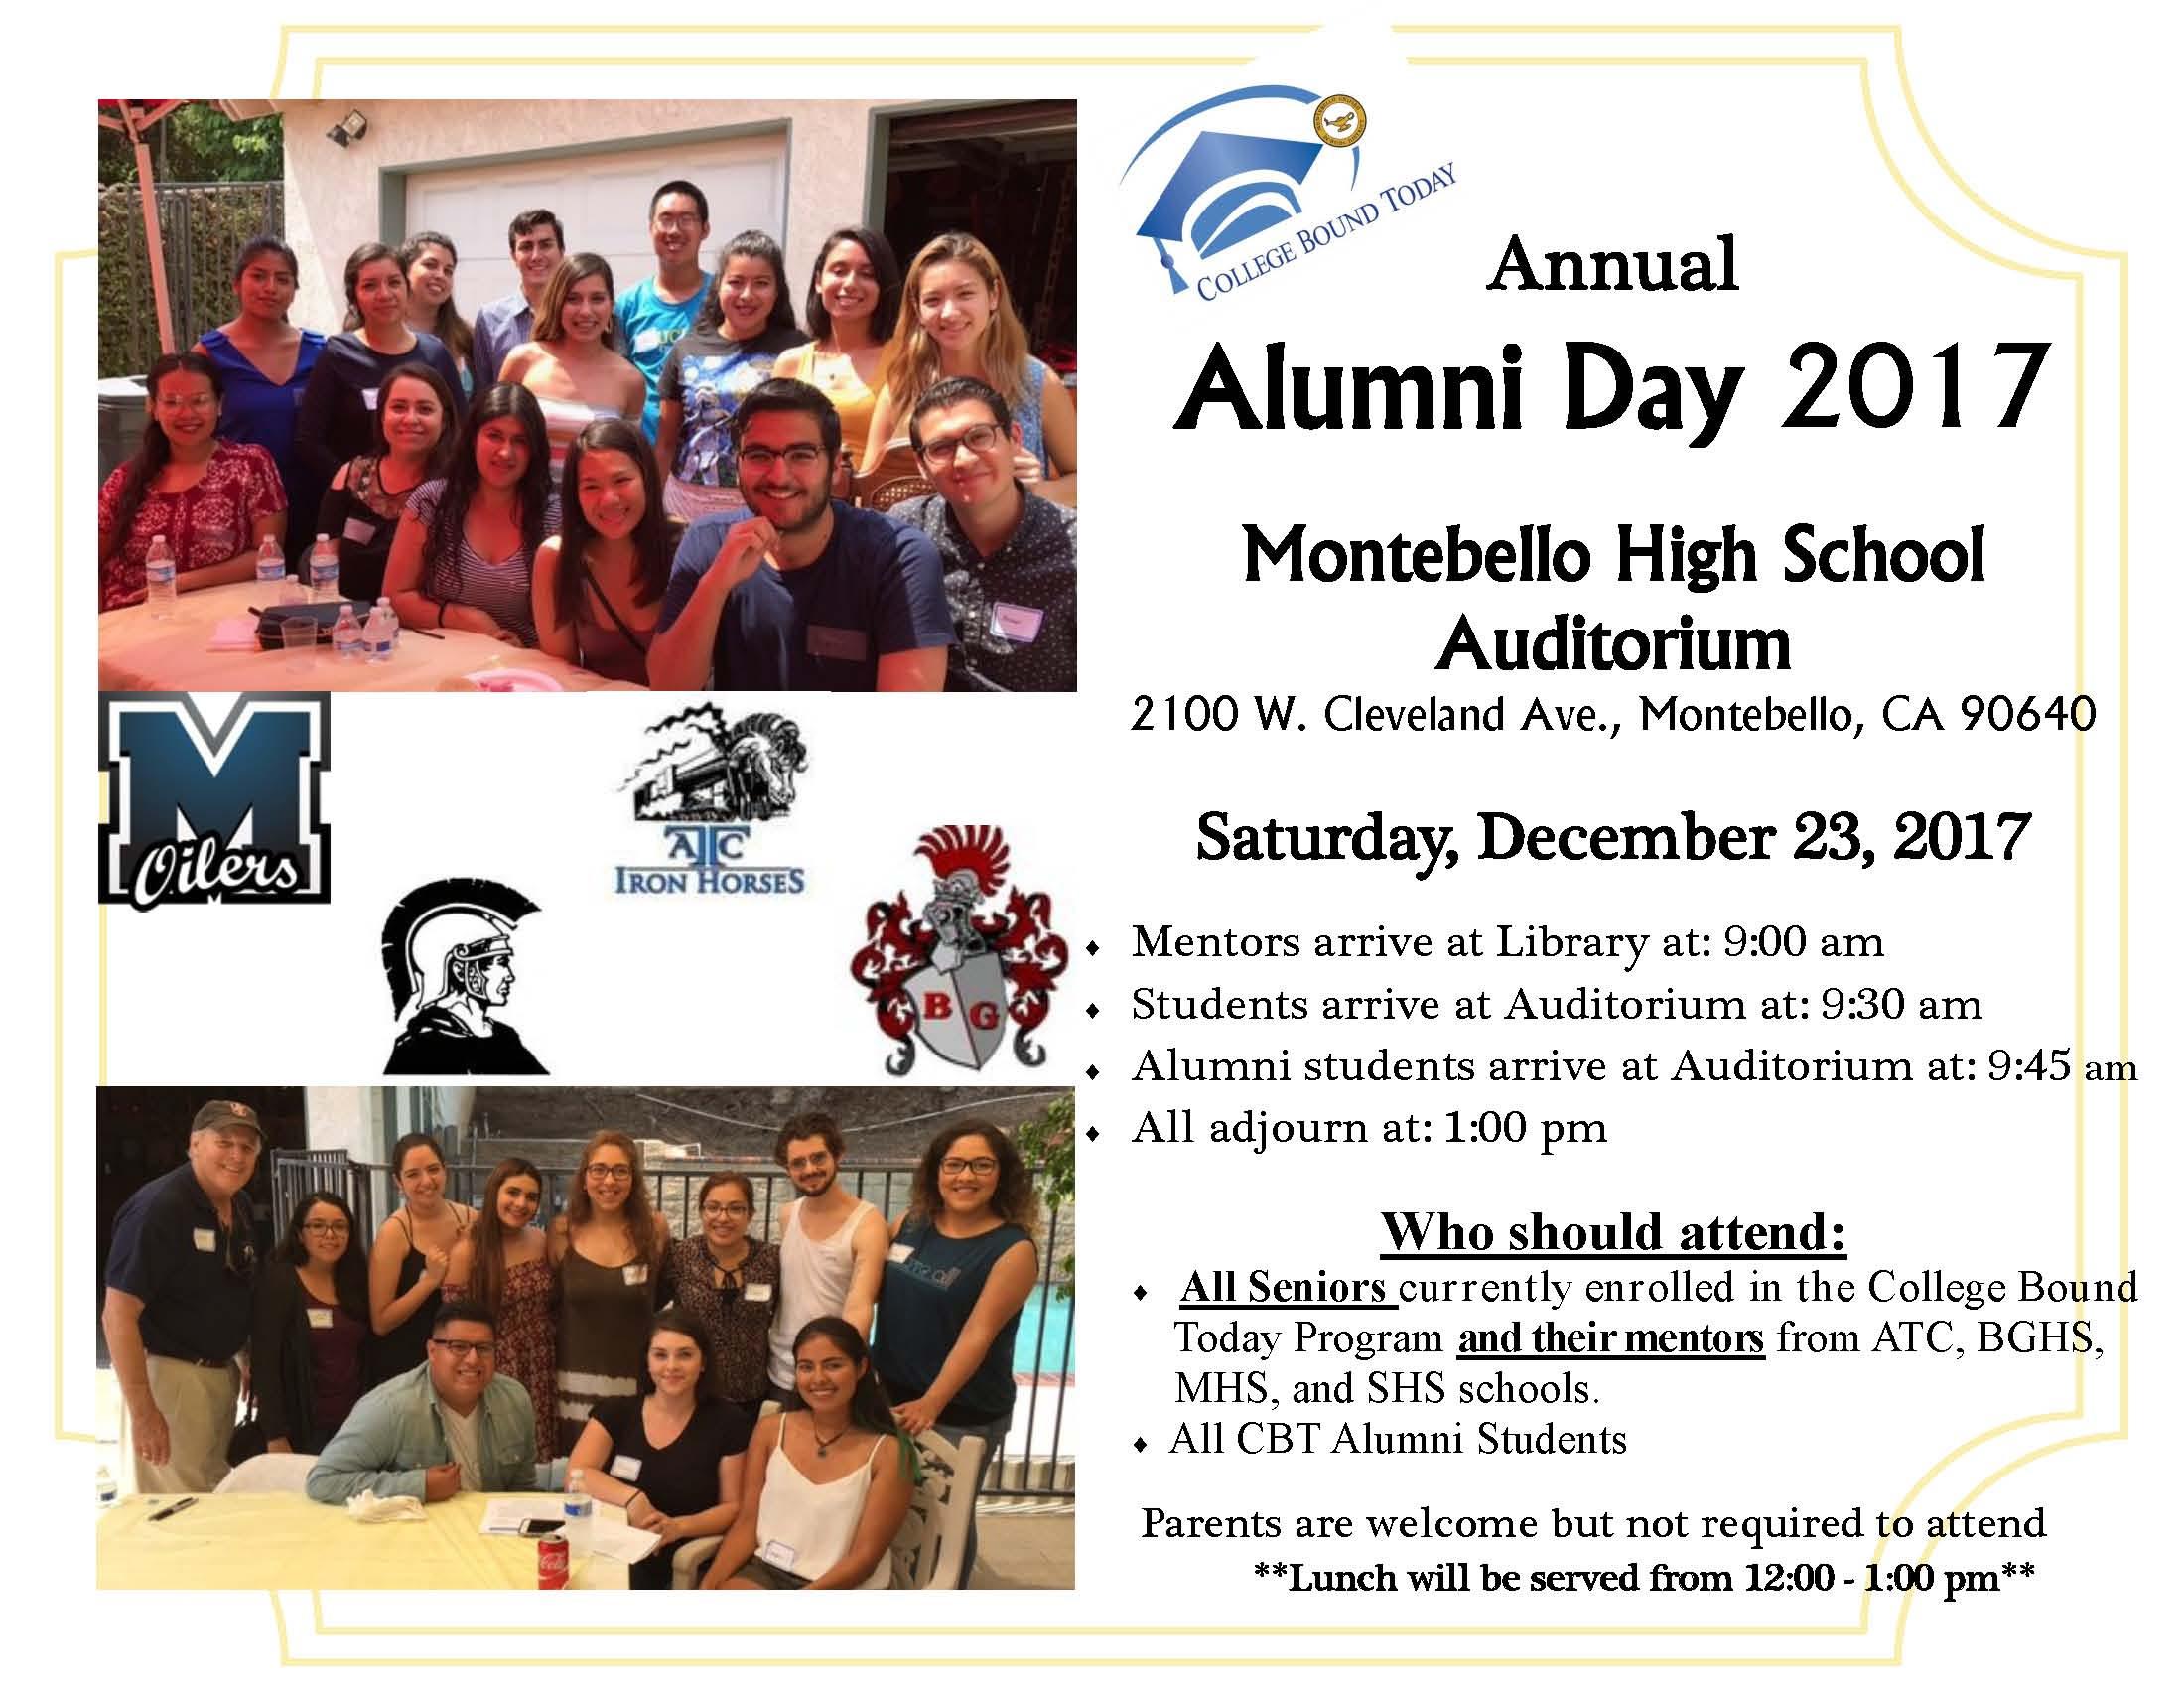 Alumni Day Flyer 2017 - Flyer_Page_1.jpg